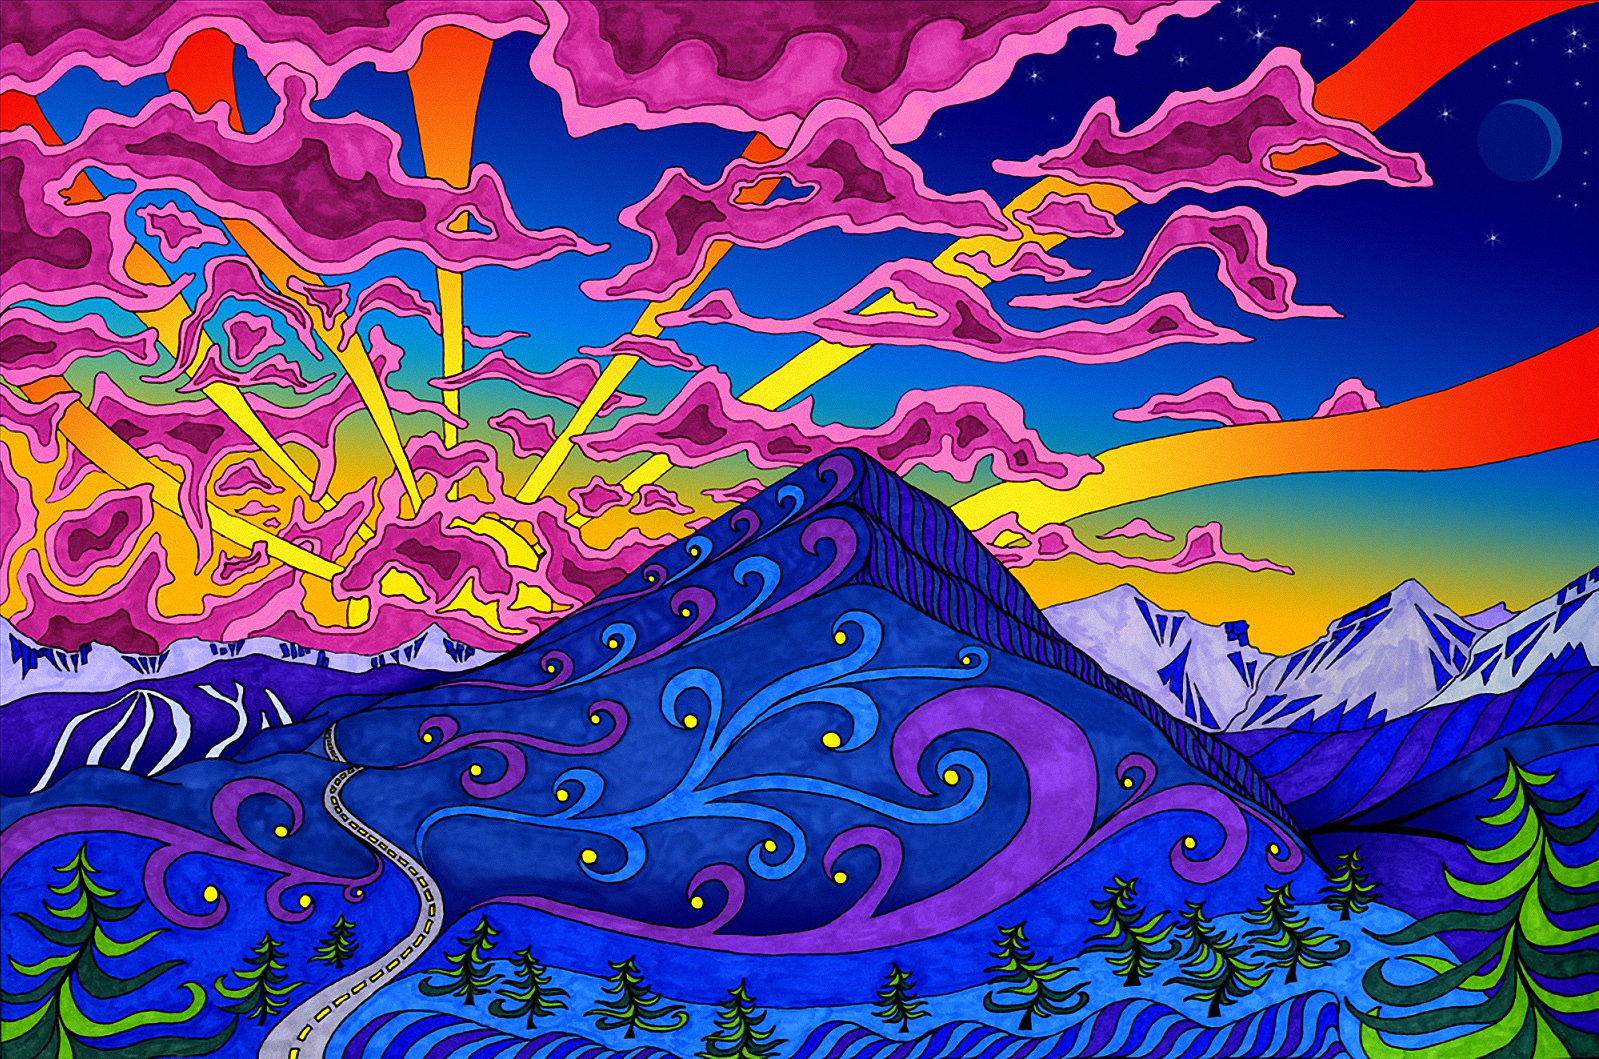 Psychedelic Computer Wallpapers Desktop Backgrounds 1599x1059 ID 1599x1059